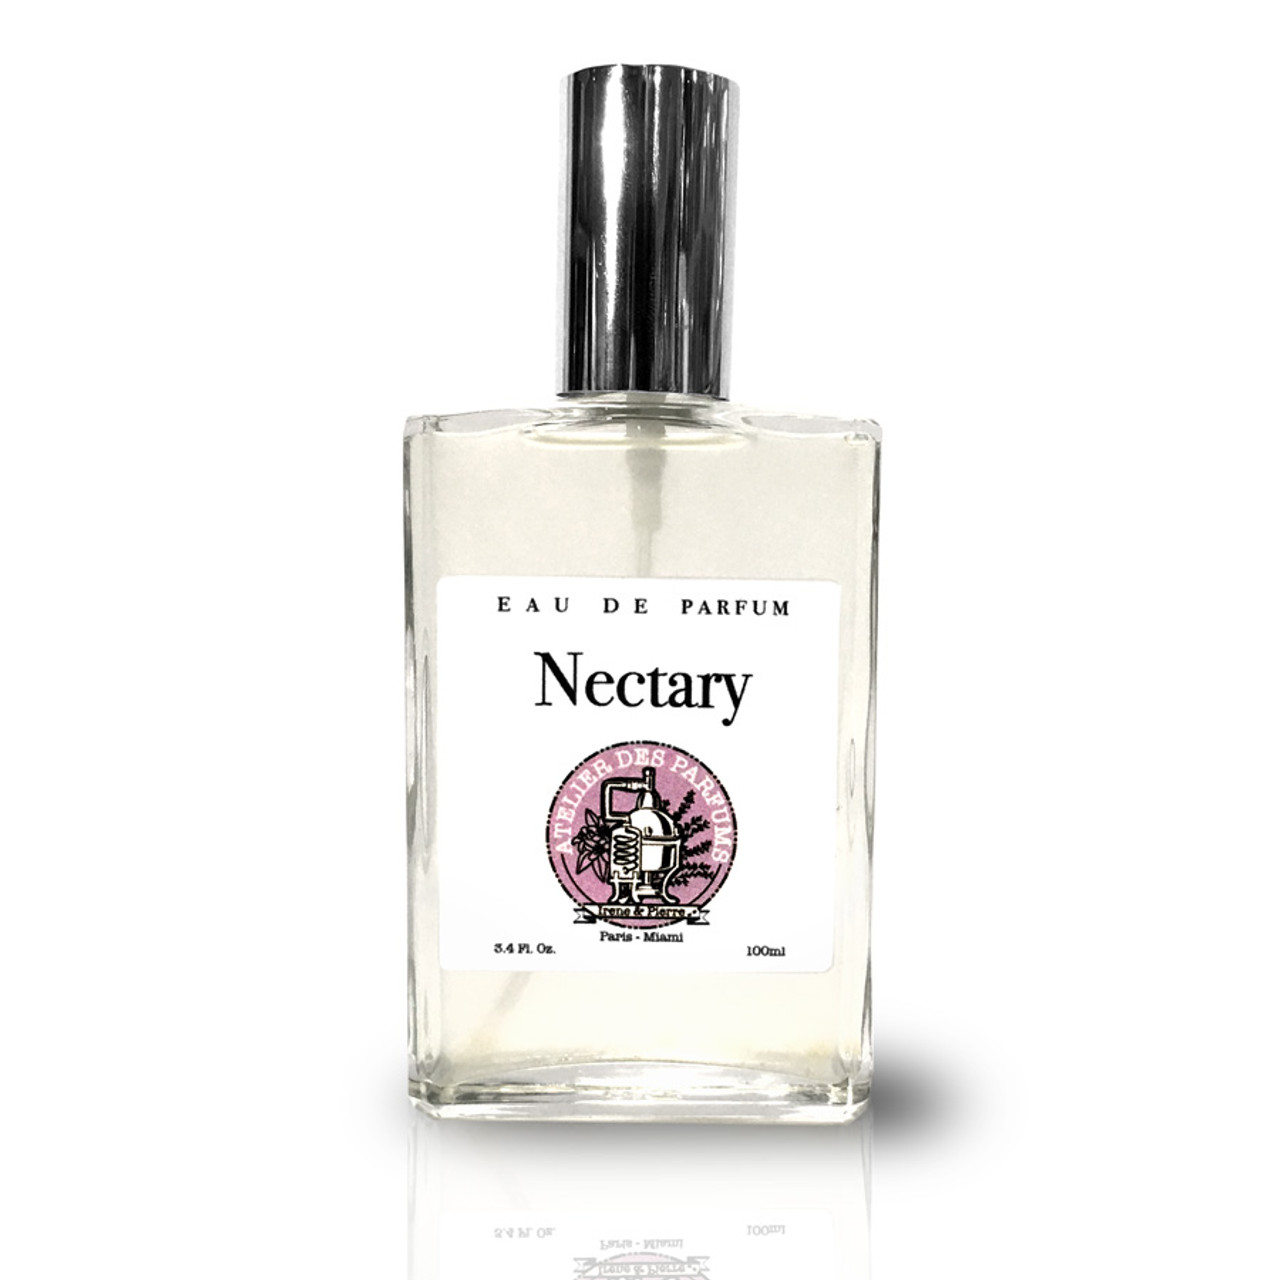 Nectary Eau de parfum 100ml Perfume made with essential oil